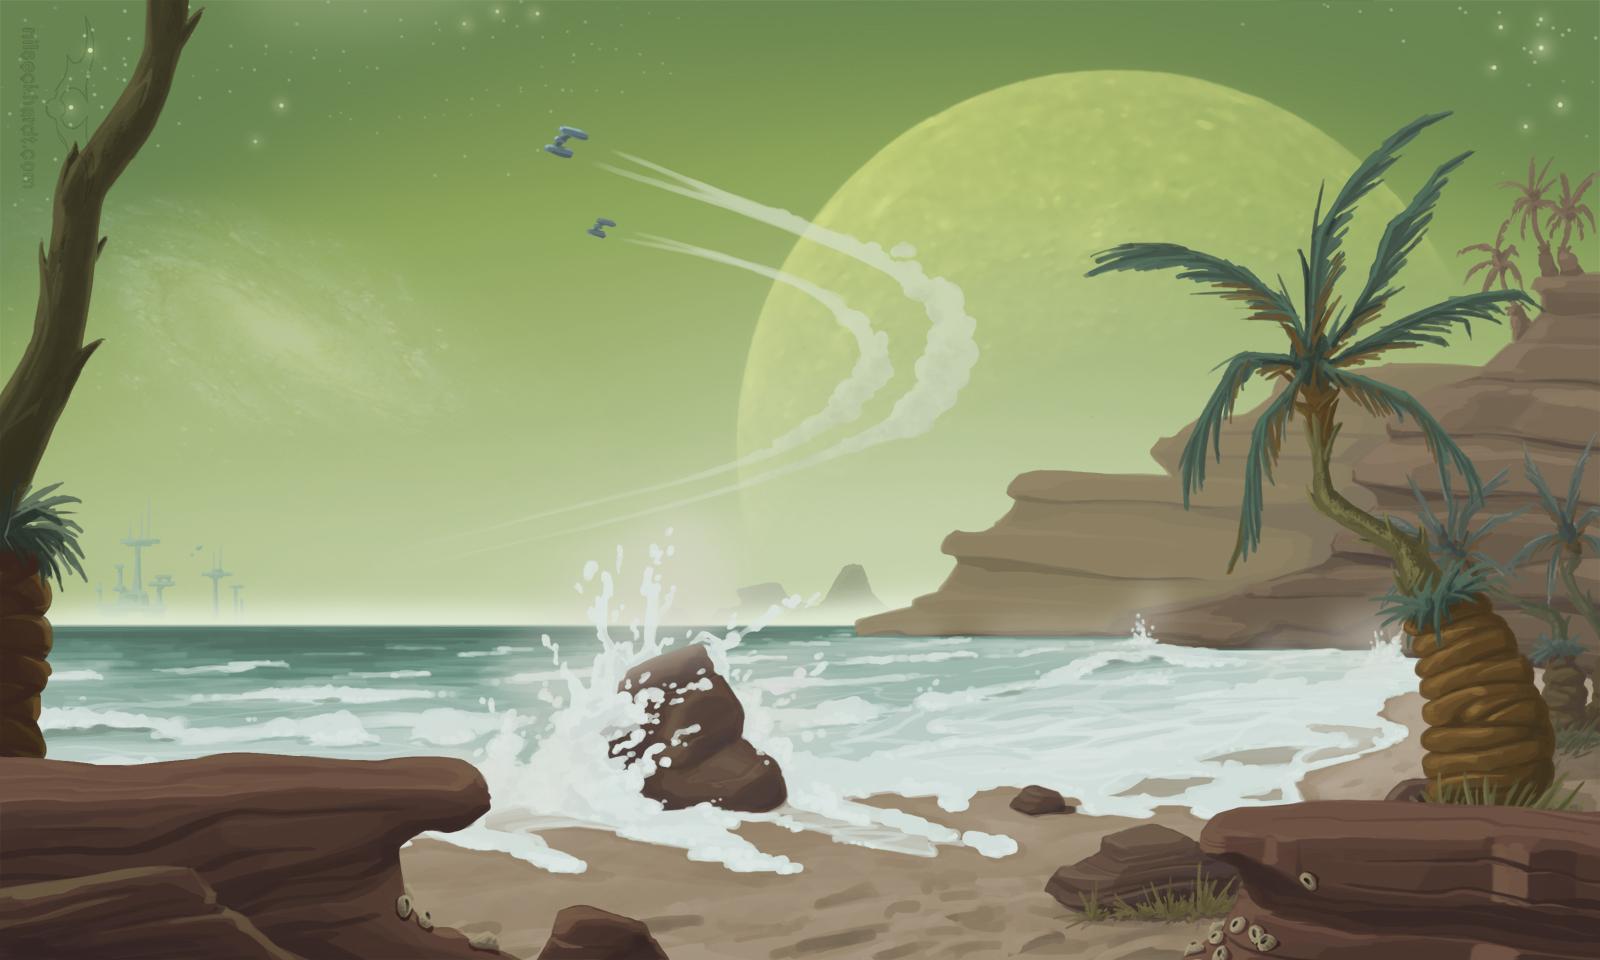 Concept Art for sci-fi environment